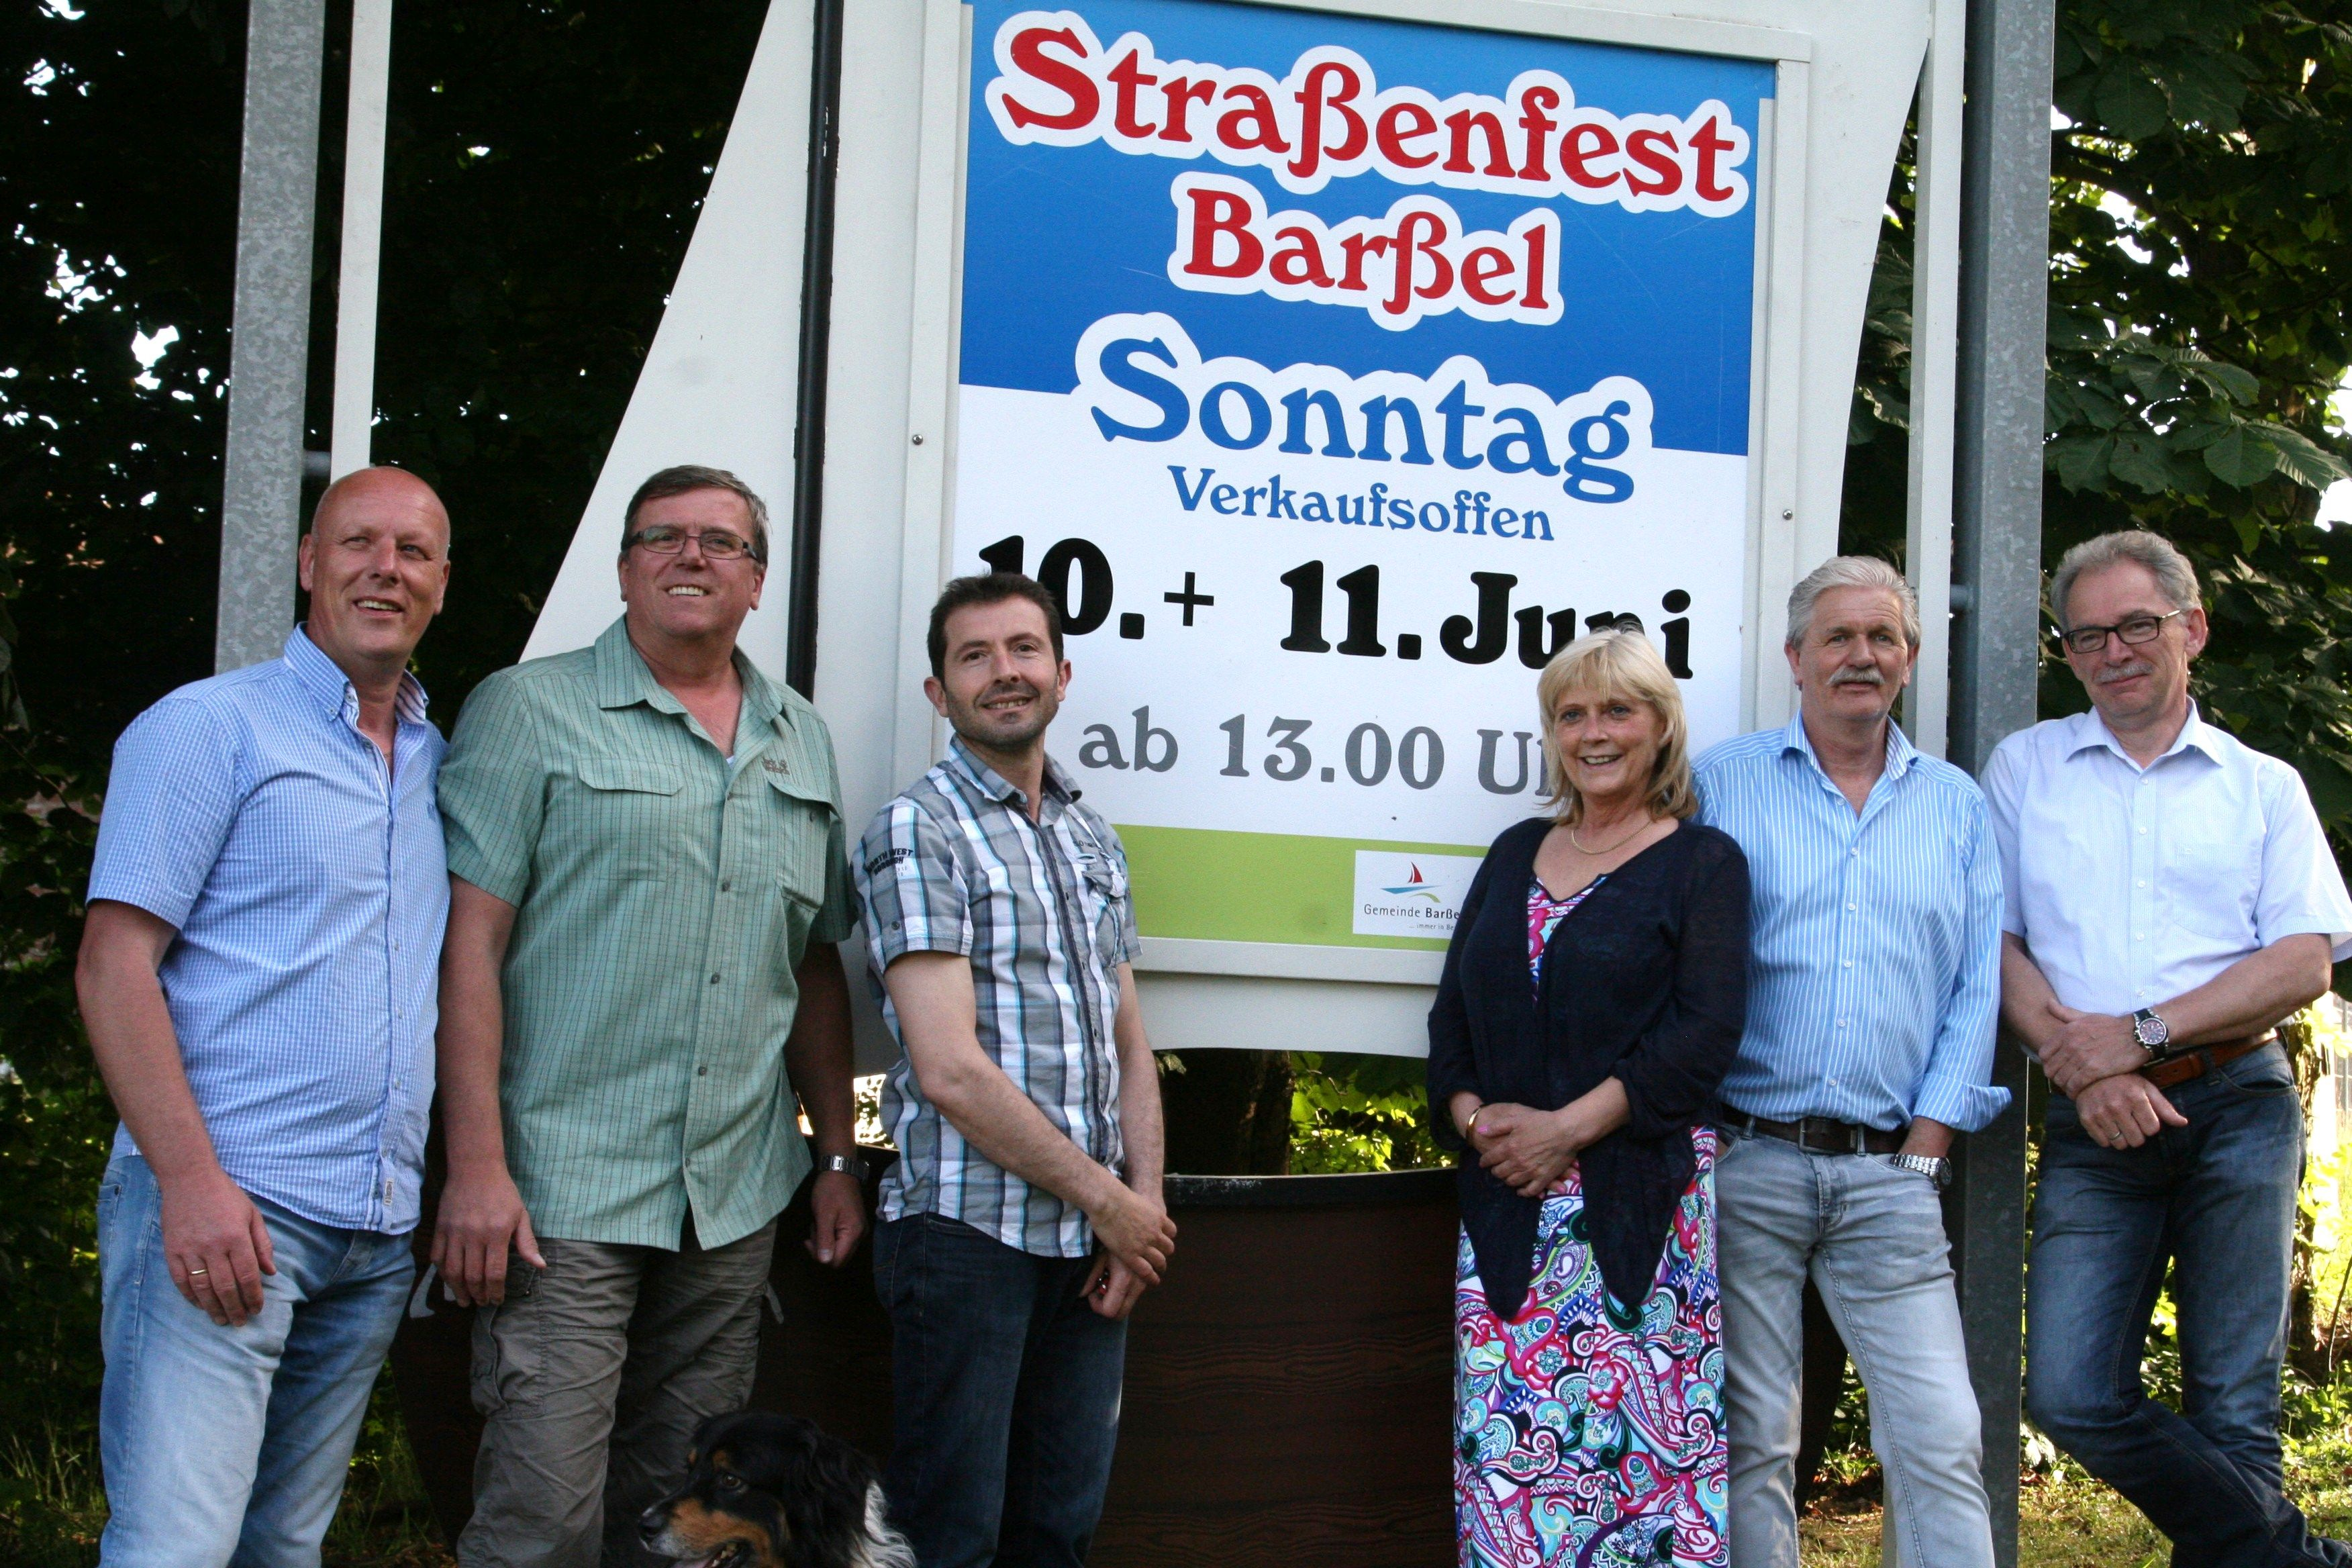 Gruppenfoto des Orga-Teams vom Straßenfest in Barßel 2017.